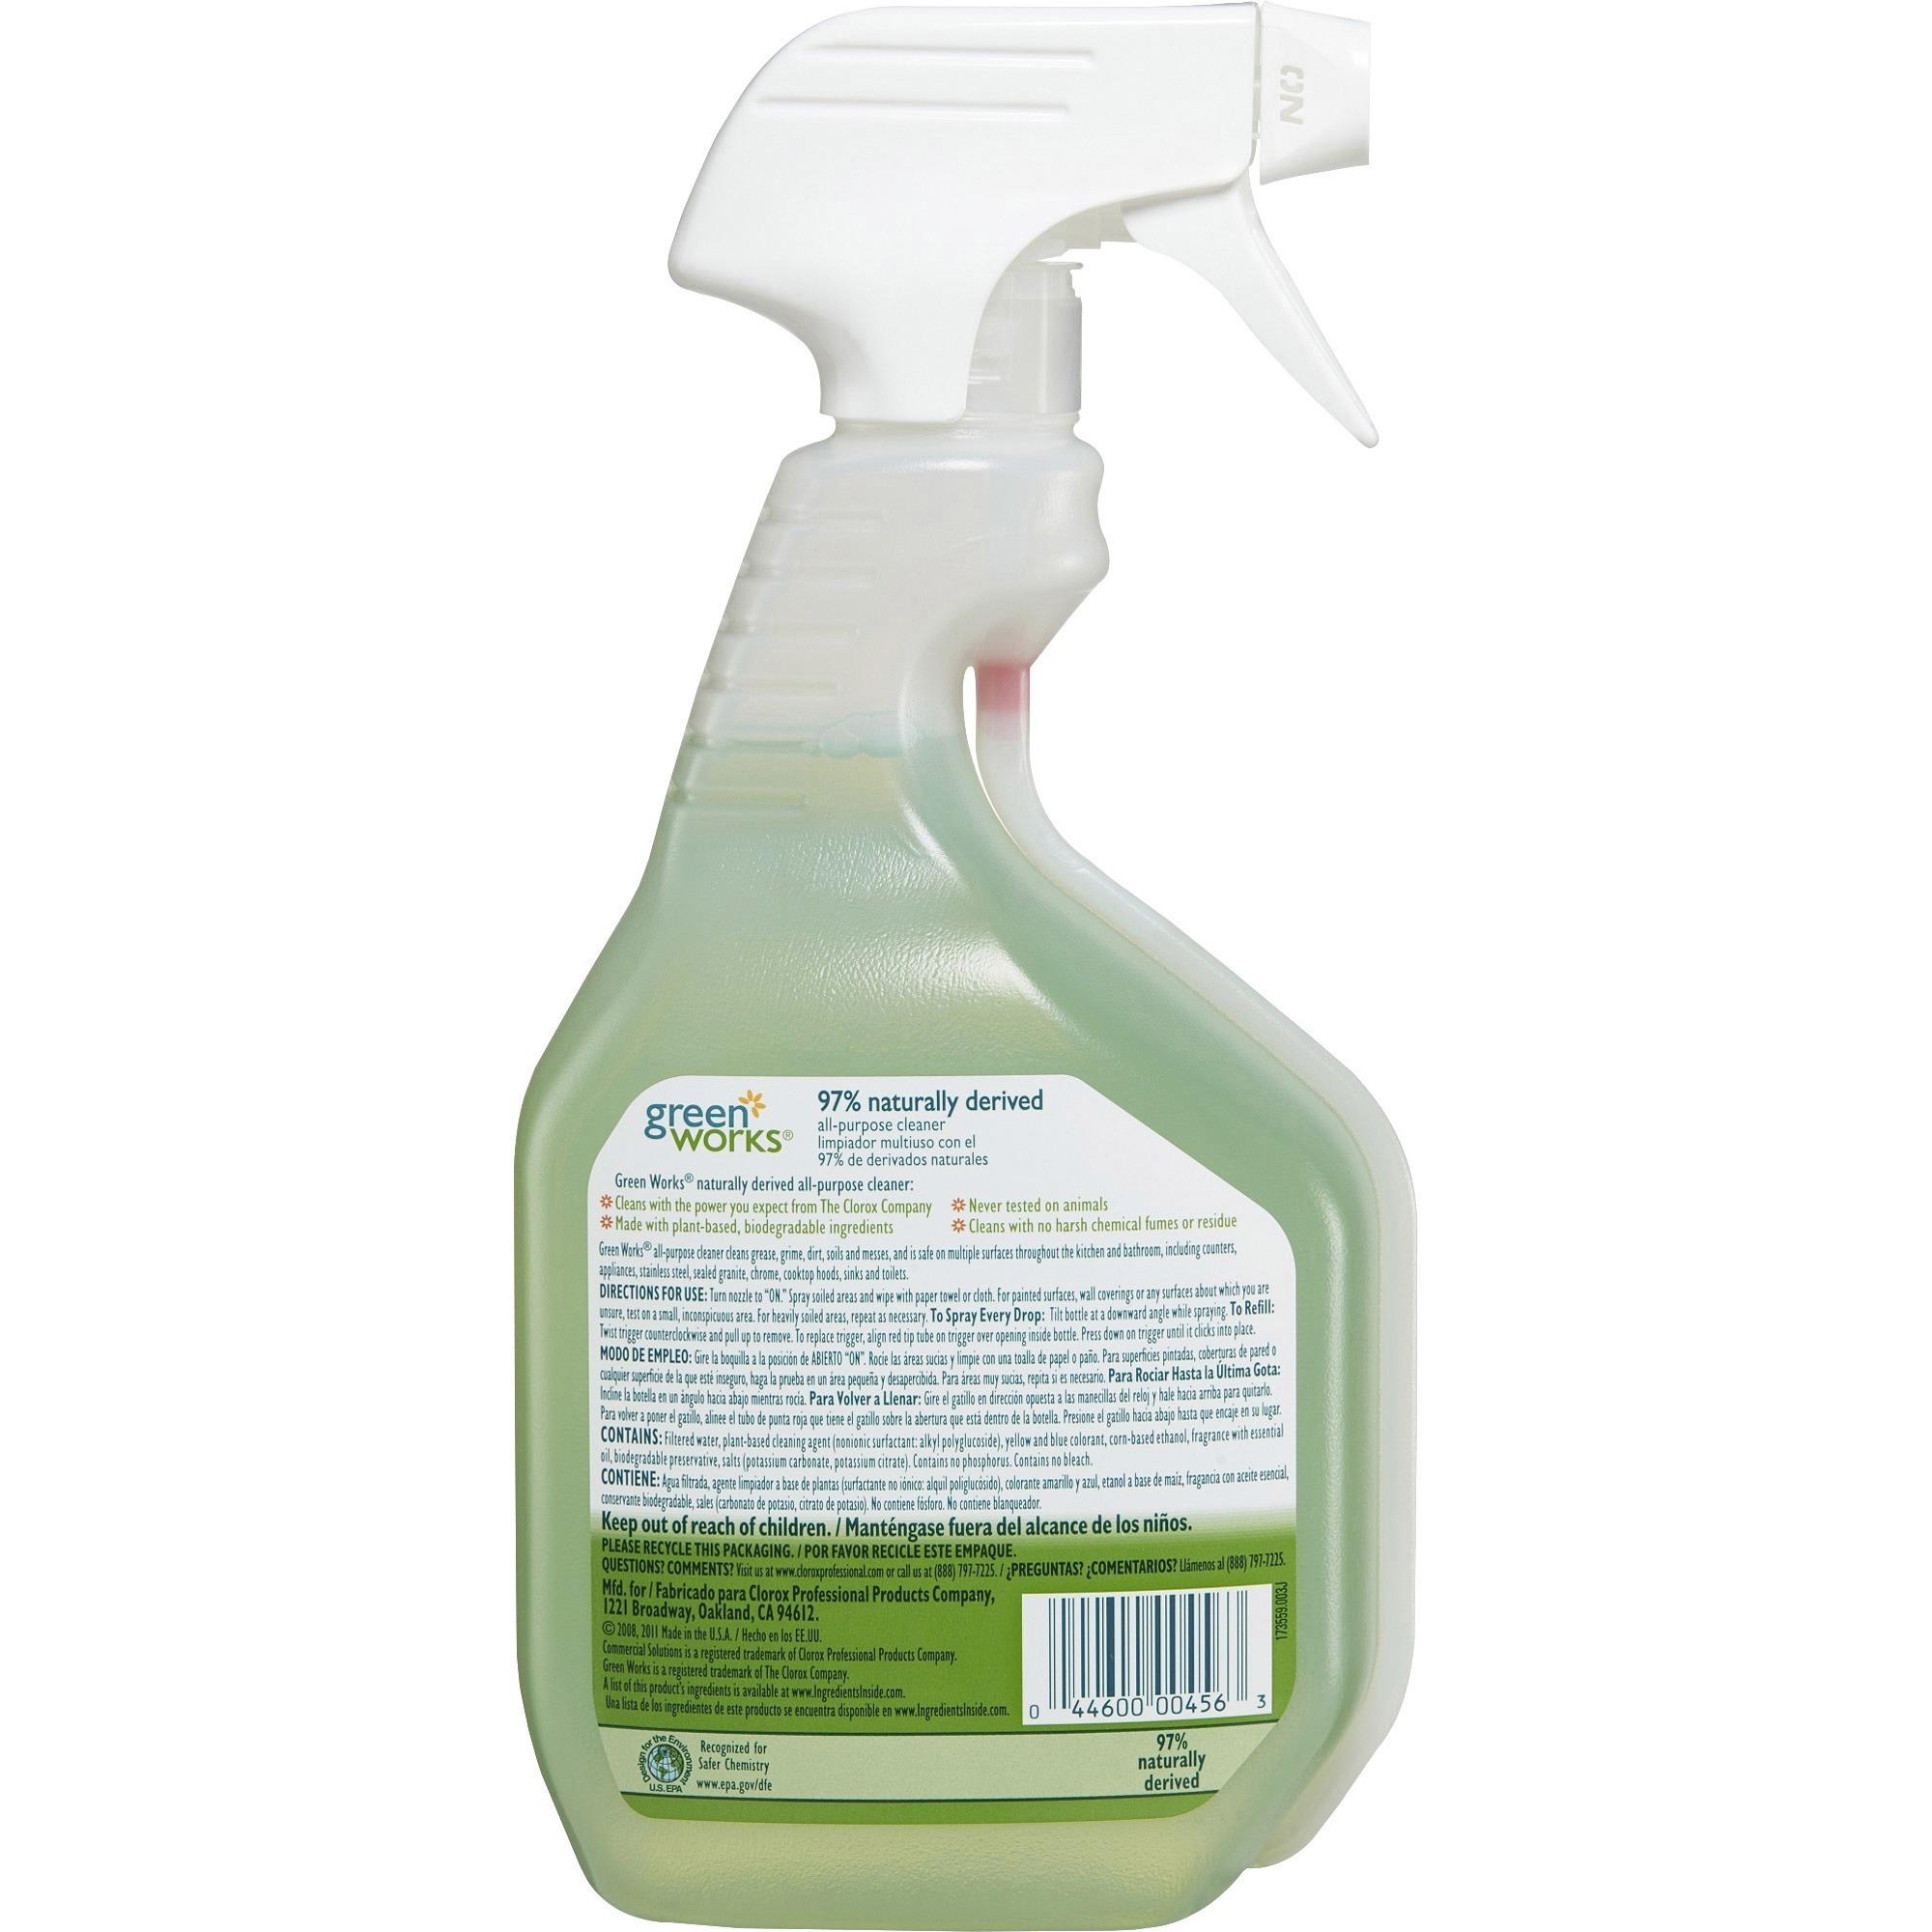 CLO00456 Green Works AllPurpose Cleaner GSA Advantage